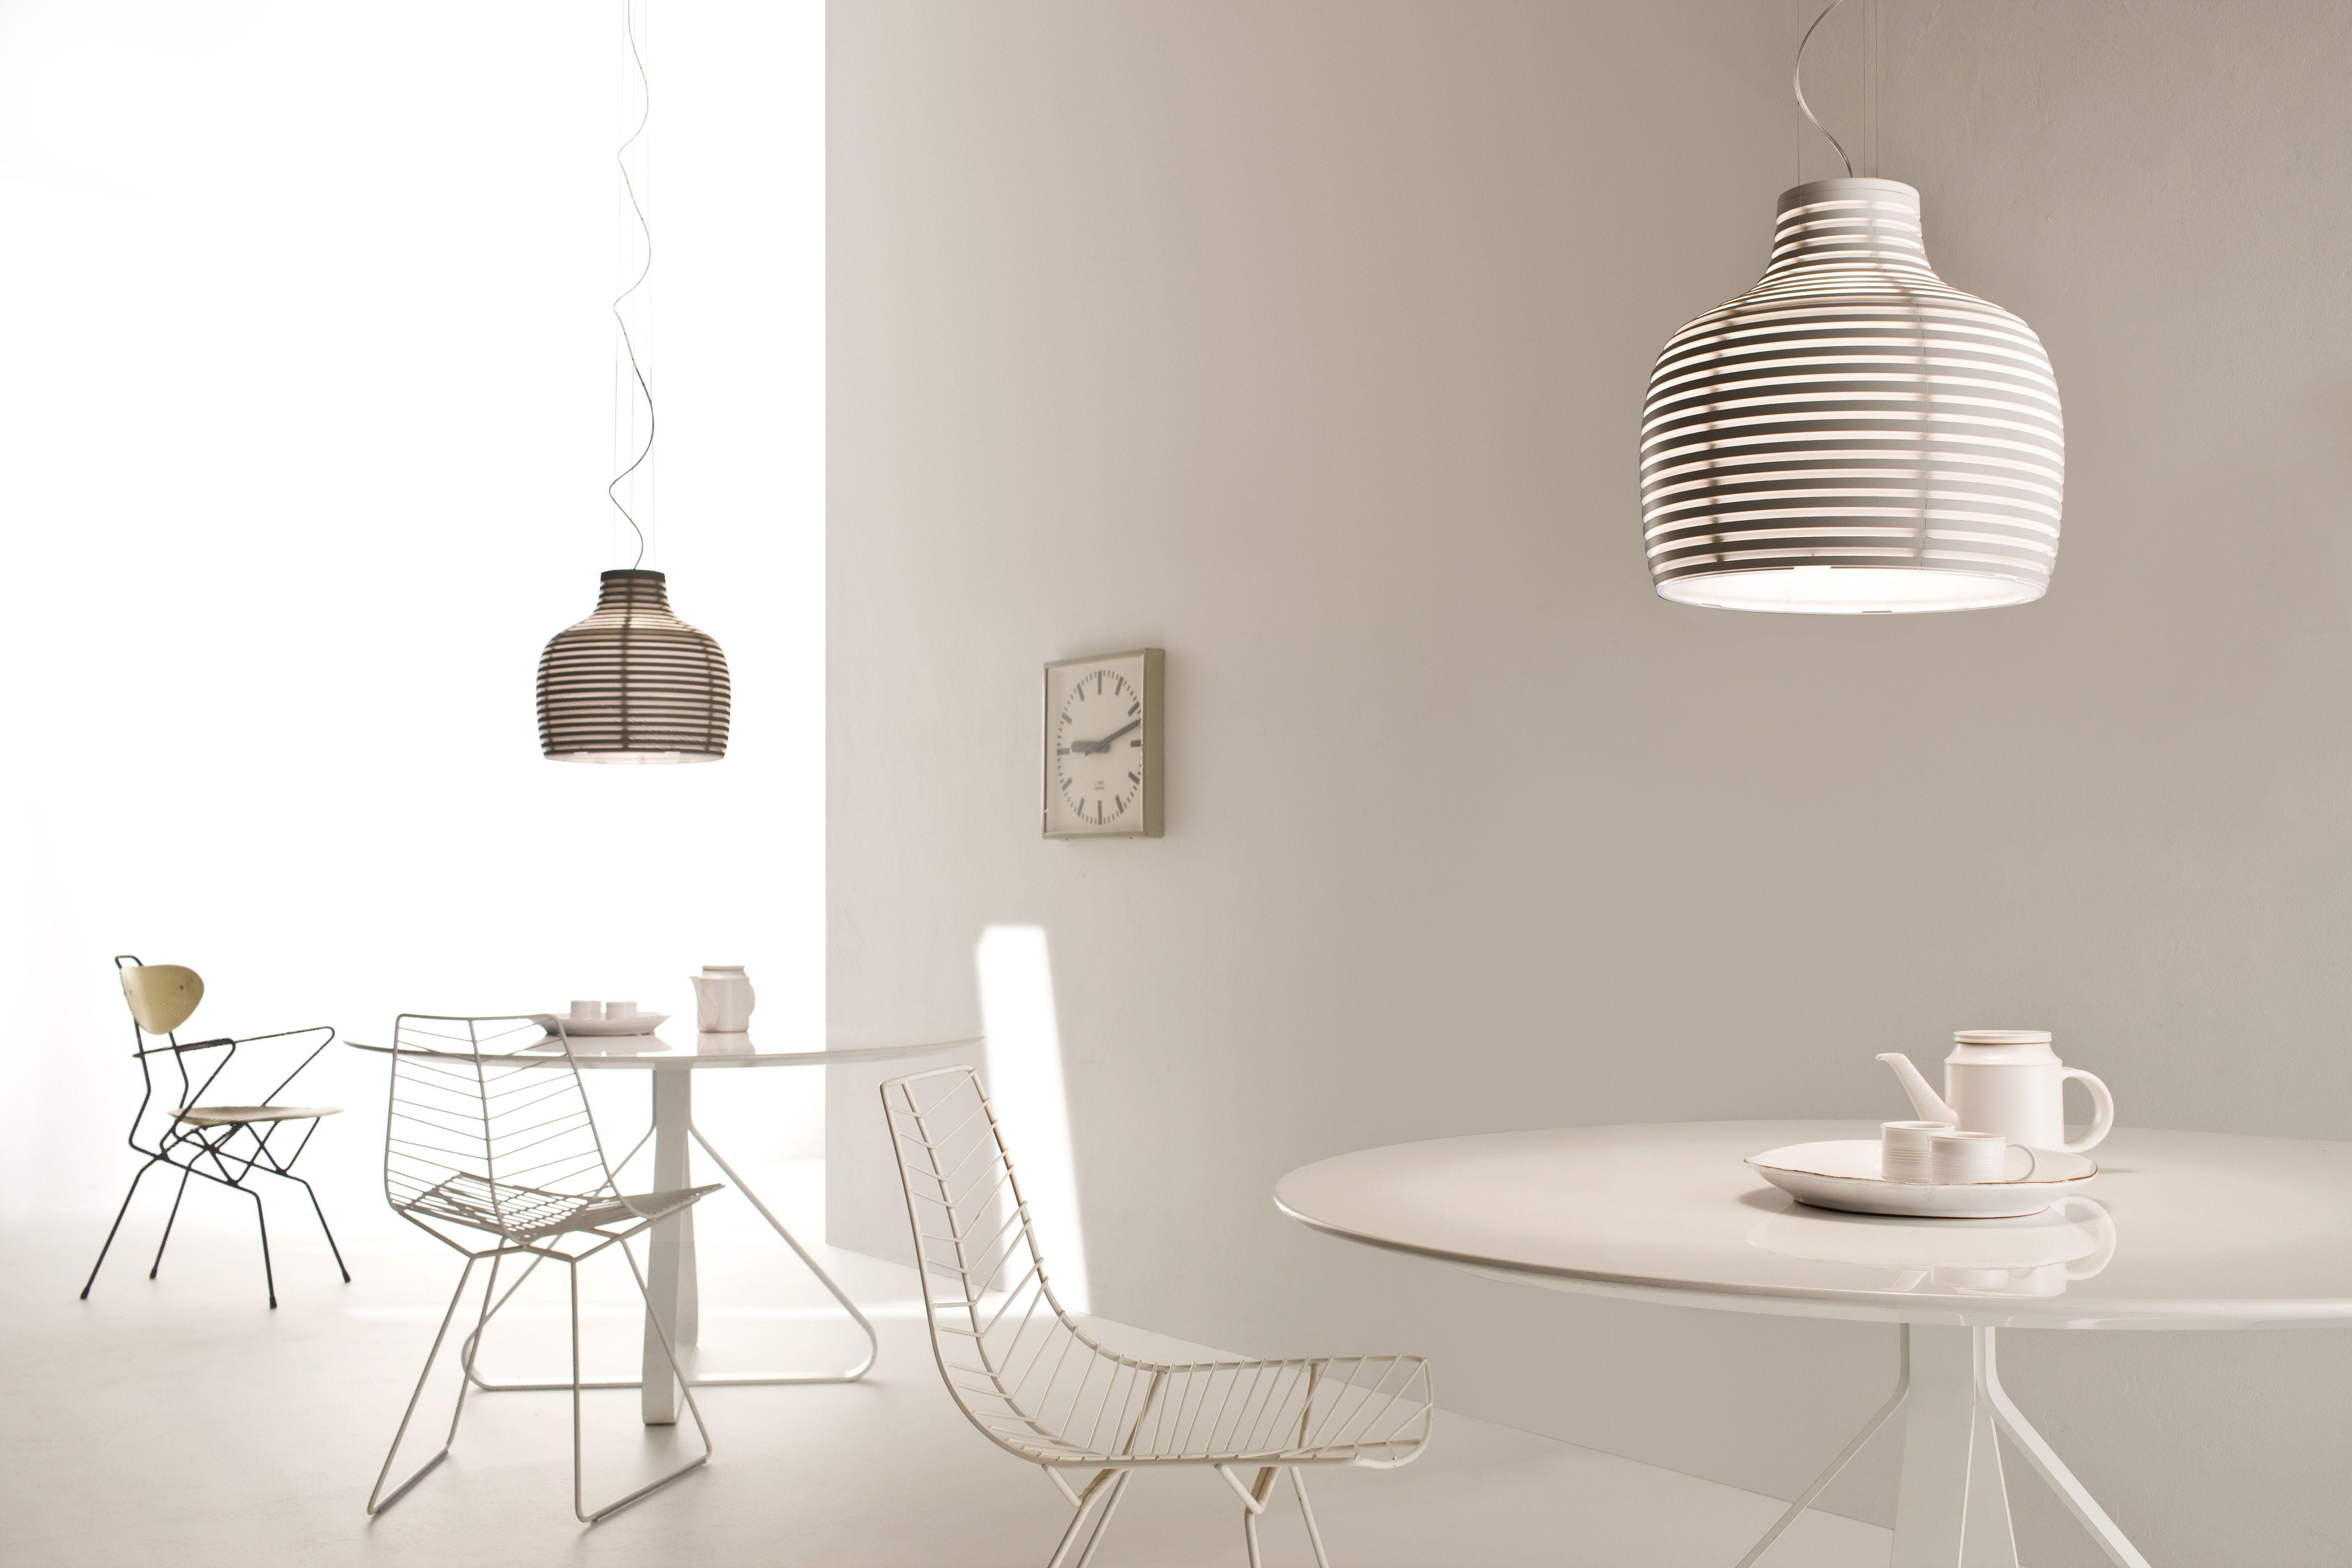 Suspension behive blanc foscarini décoration et mobilier design avec made in design